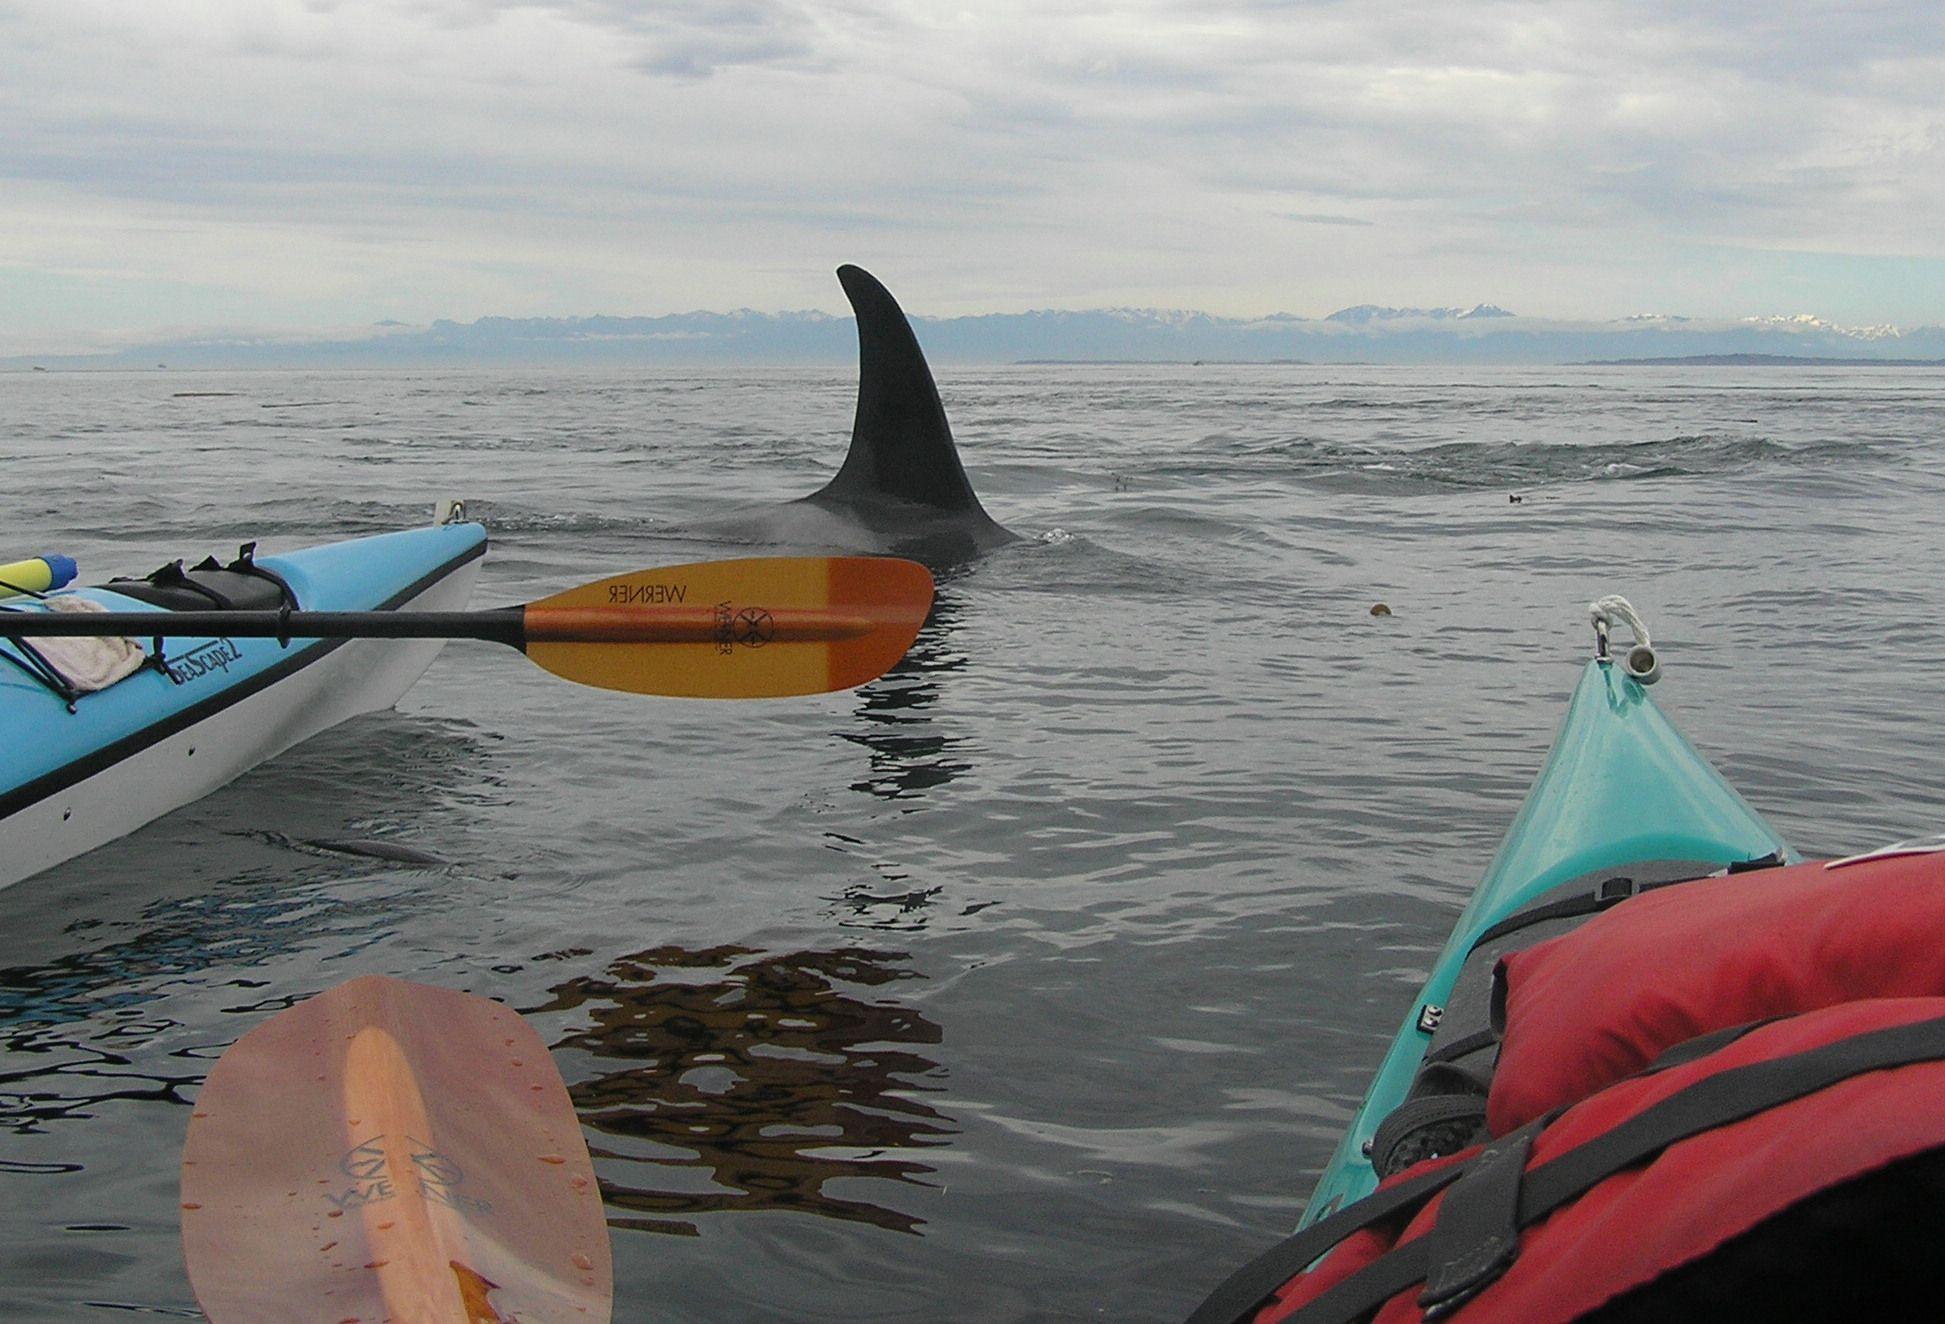 Pin By San Juan Kayak Expeditions On Sea Kayaking In The San Juan Islands Kayaking Sea Kayaking Kayak Camping